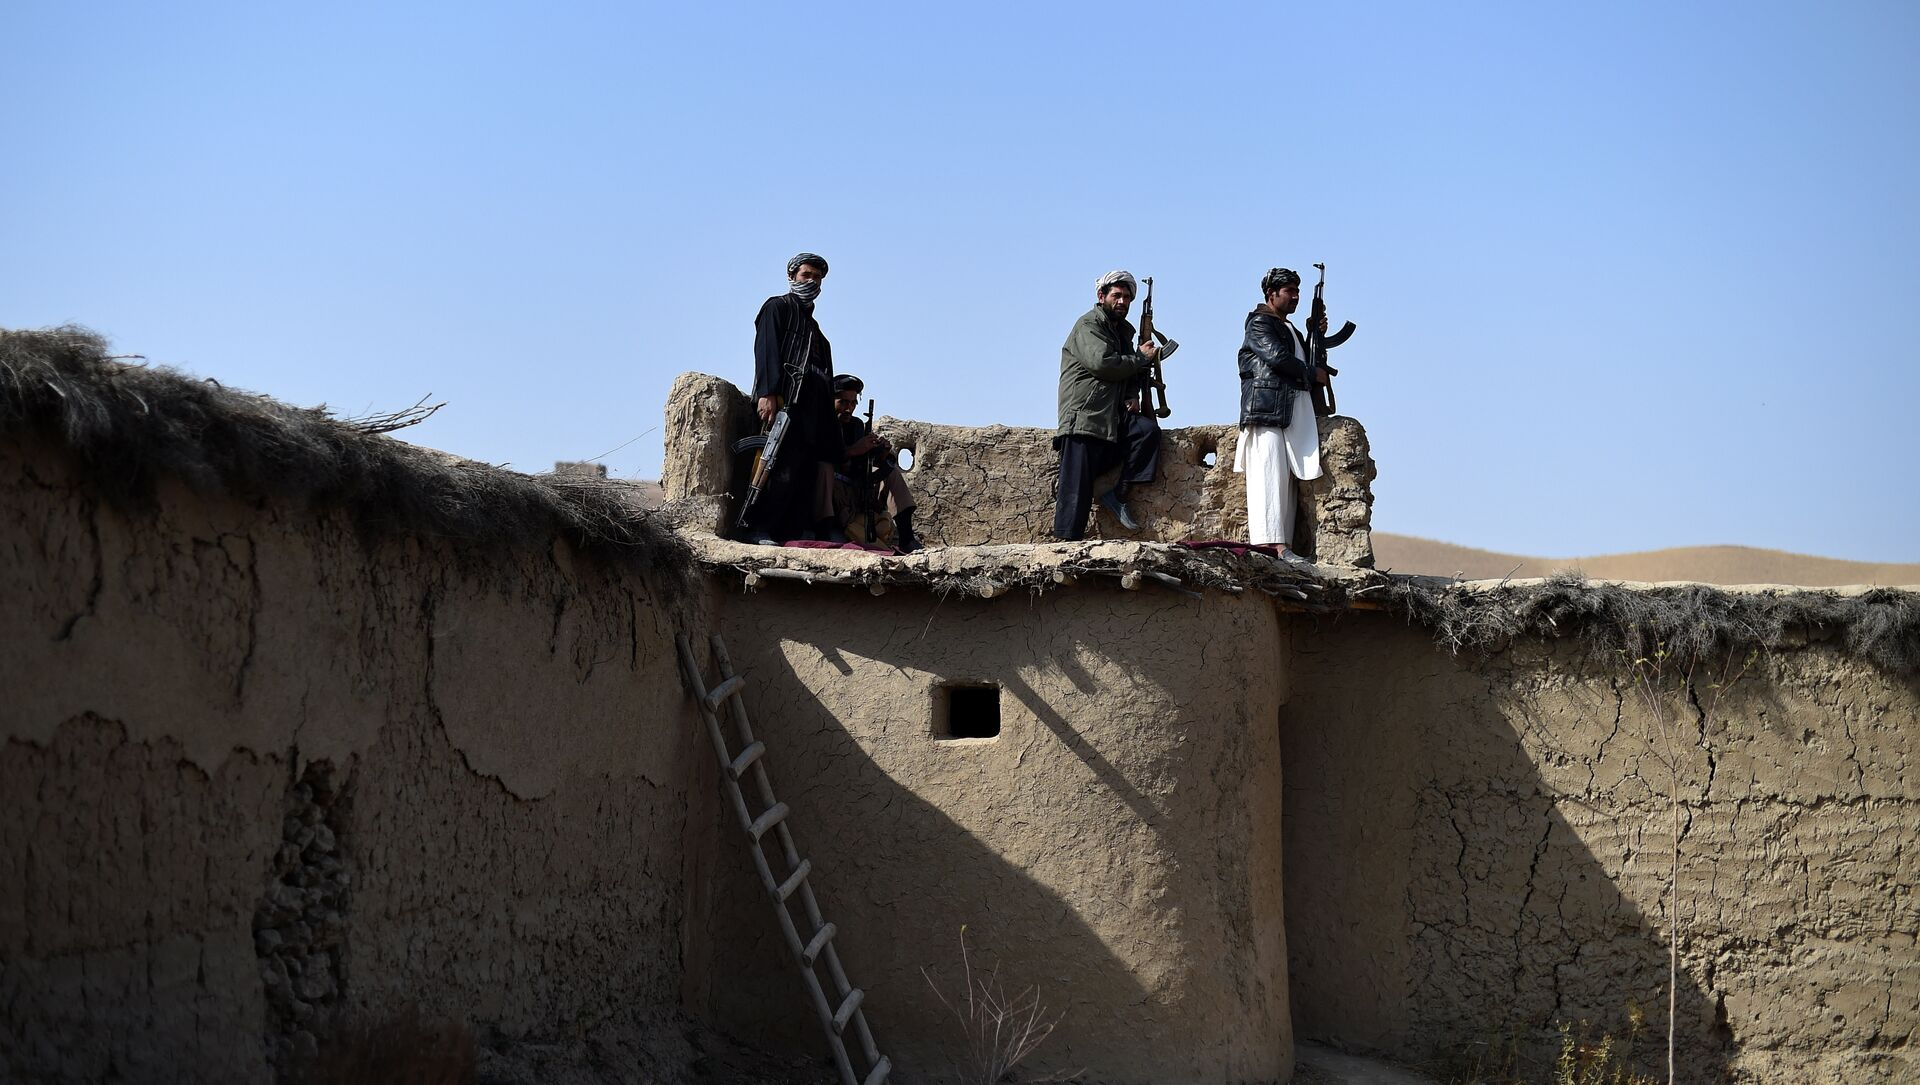 Боевики движения Талибан. Архивное фото - Sputnik Азербайджан, 1920, 11.08.2021